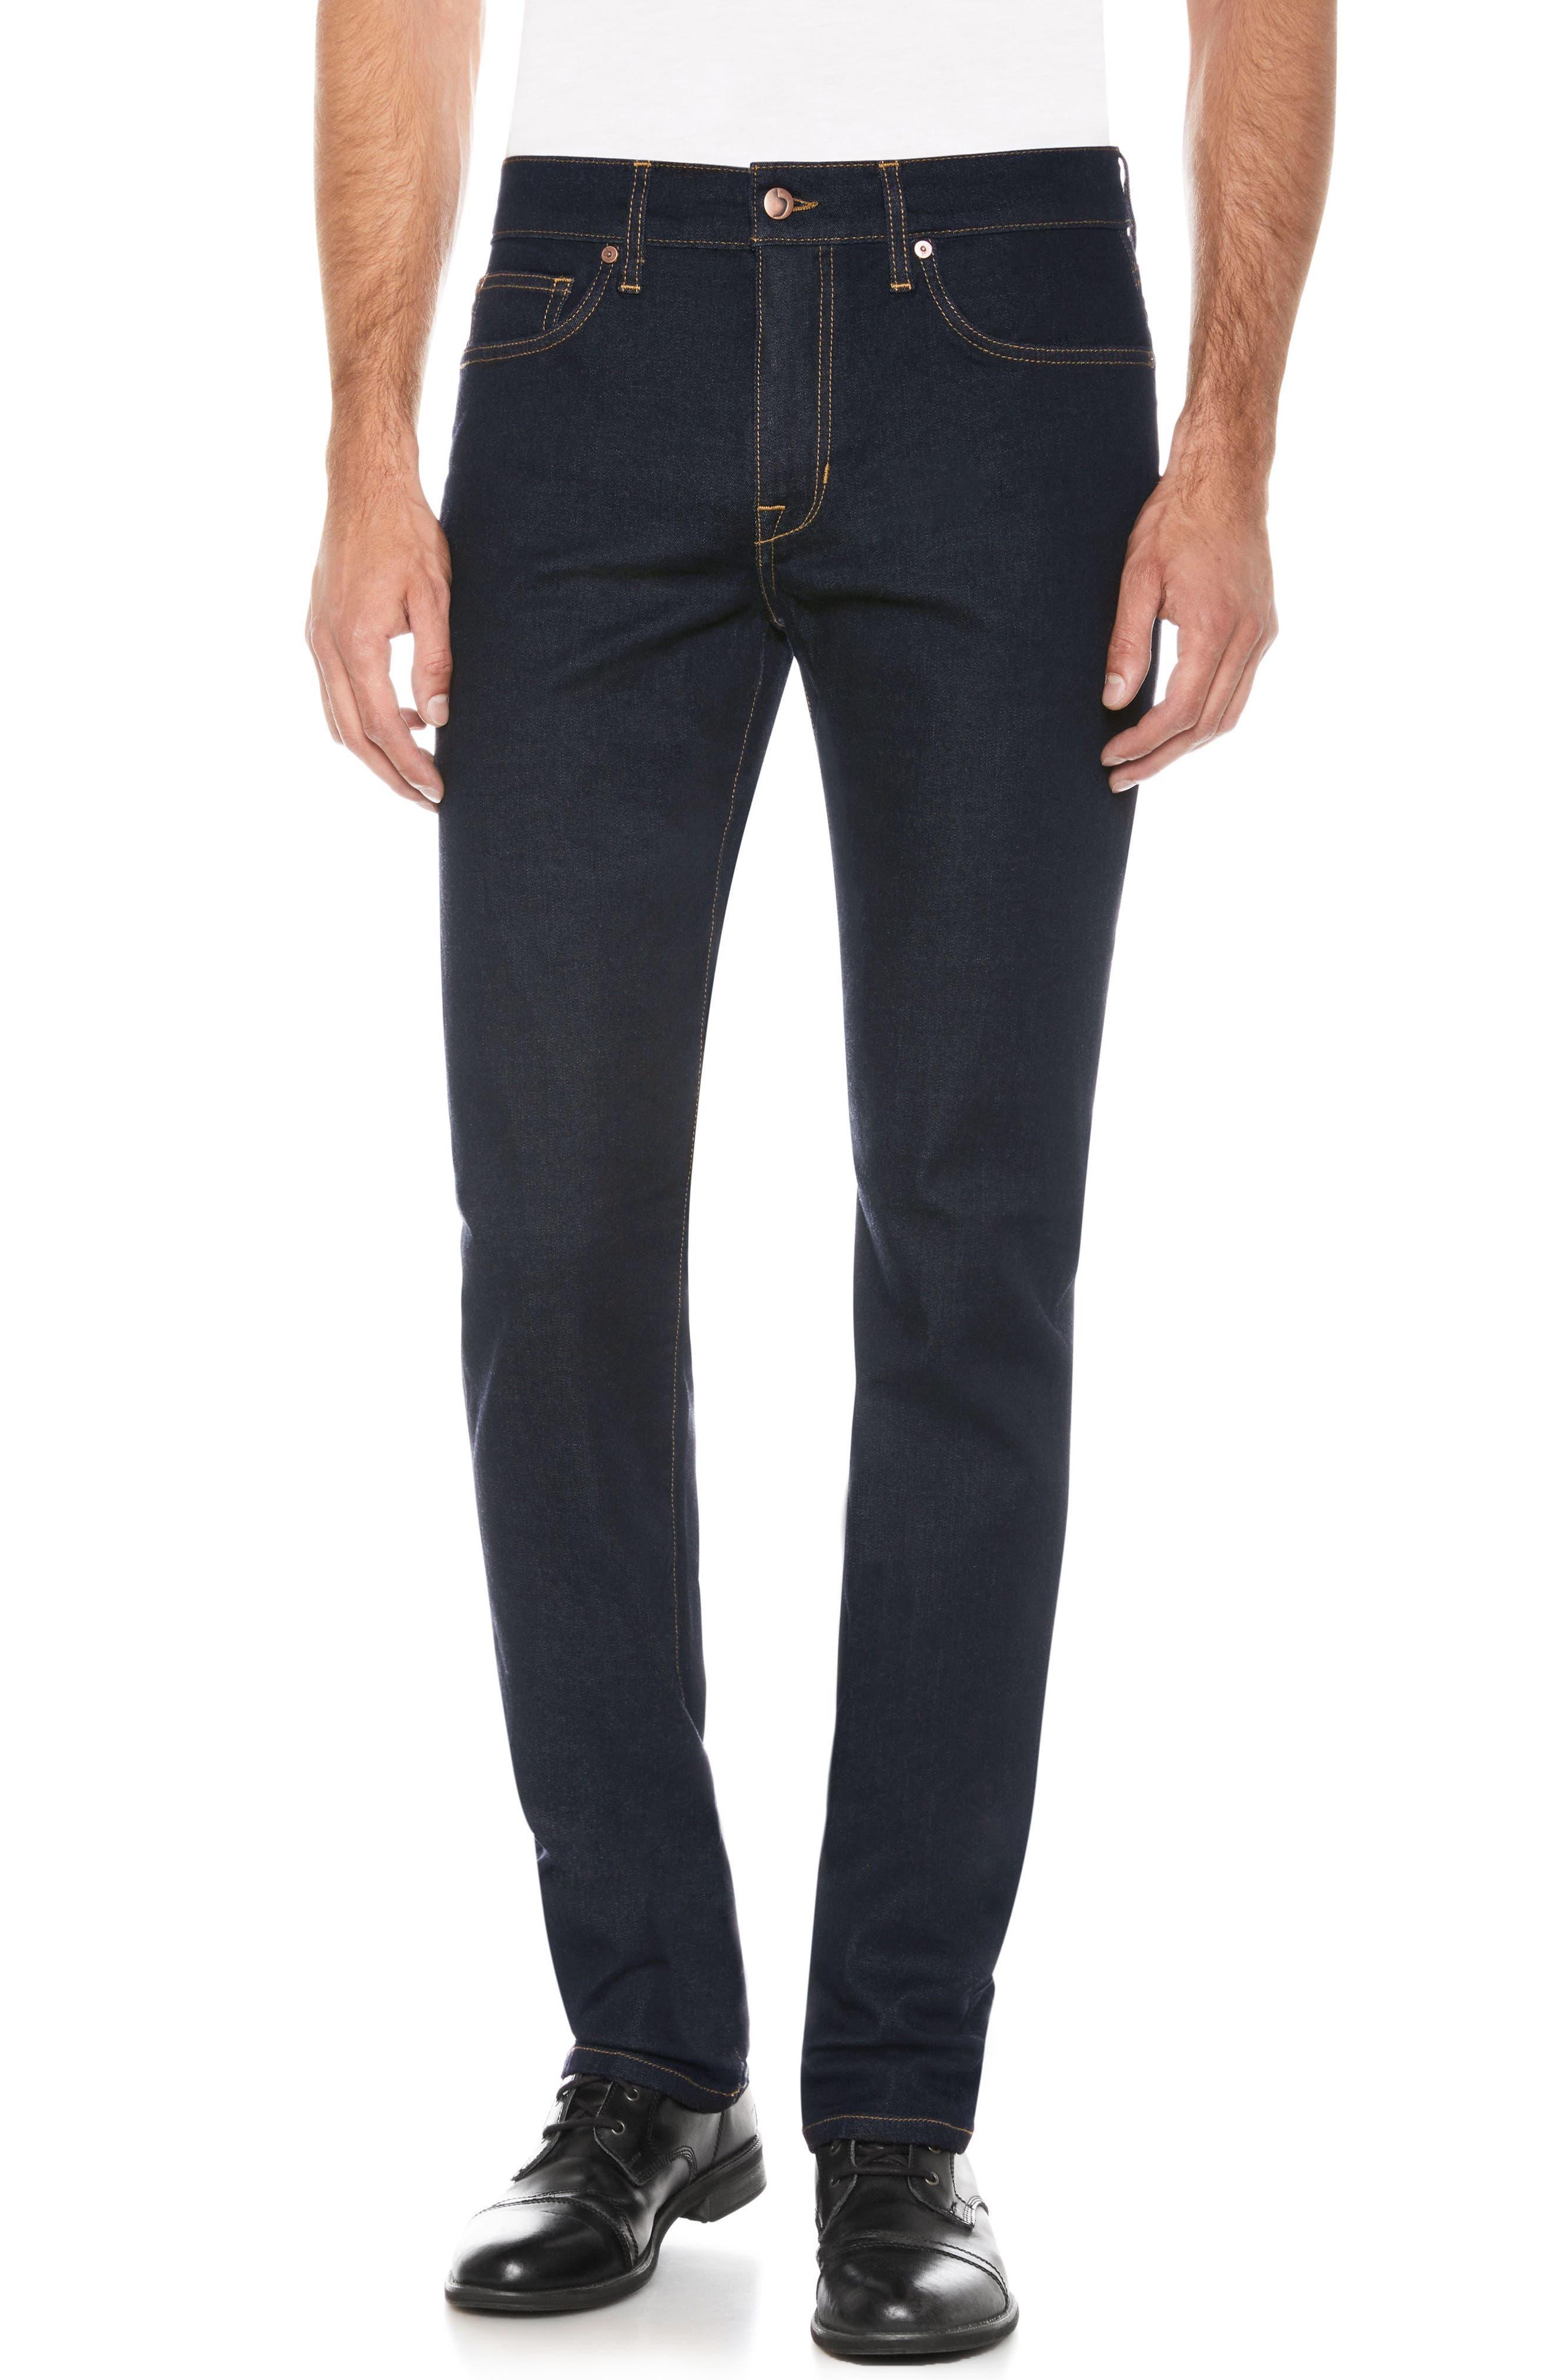 Brixton Slim Straight Fit Jeans,                         Main,                         color, Jazz